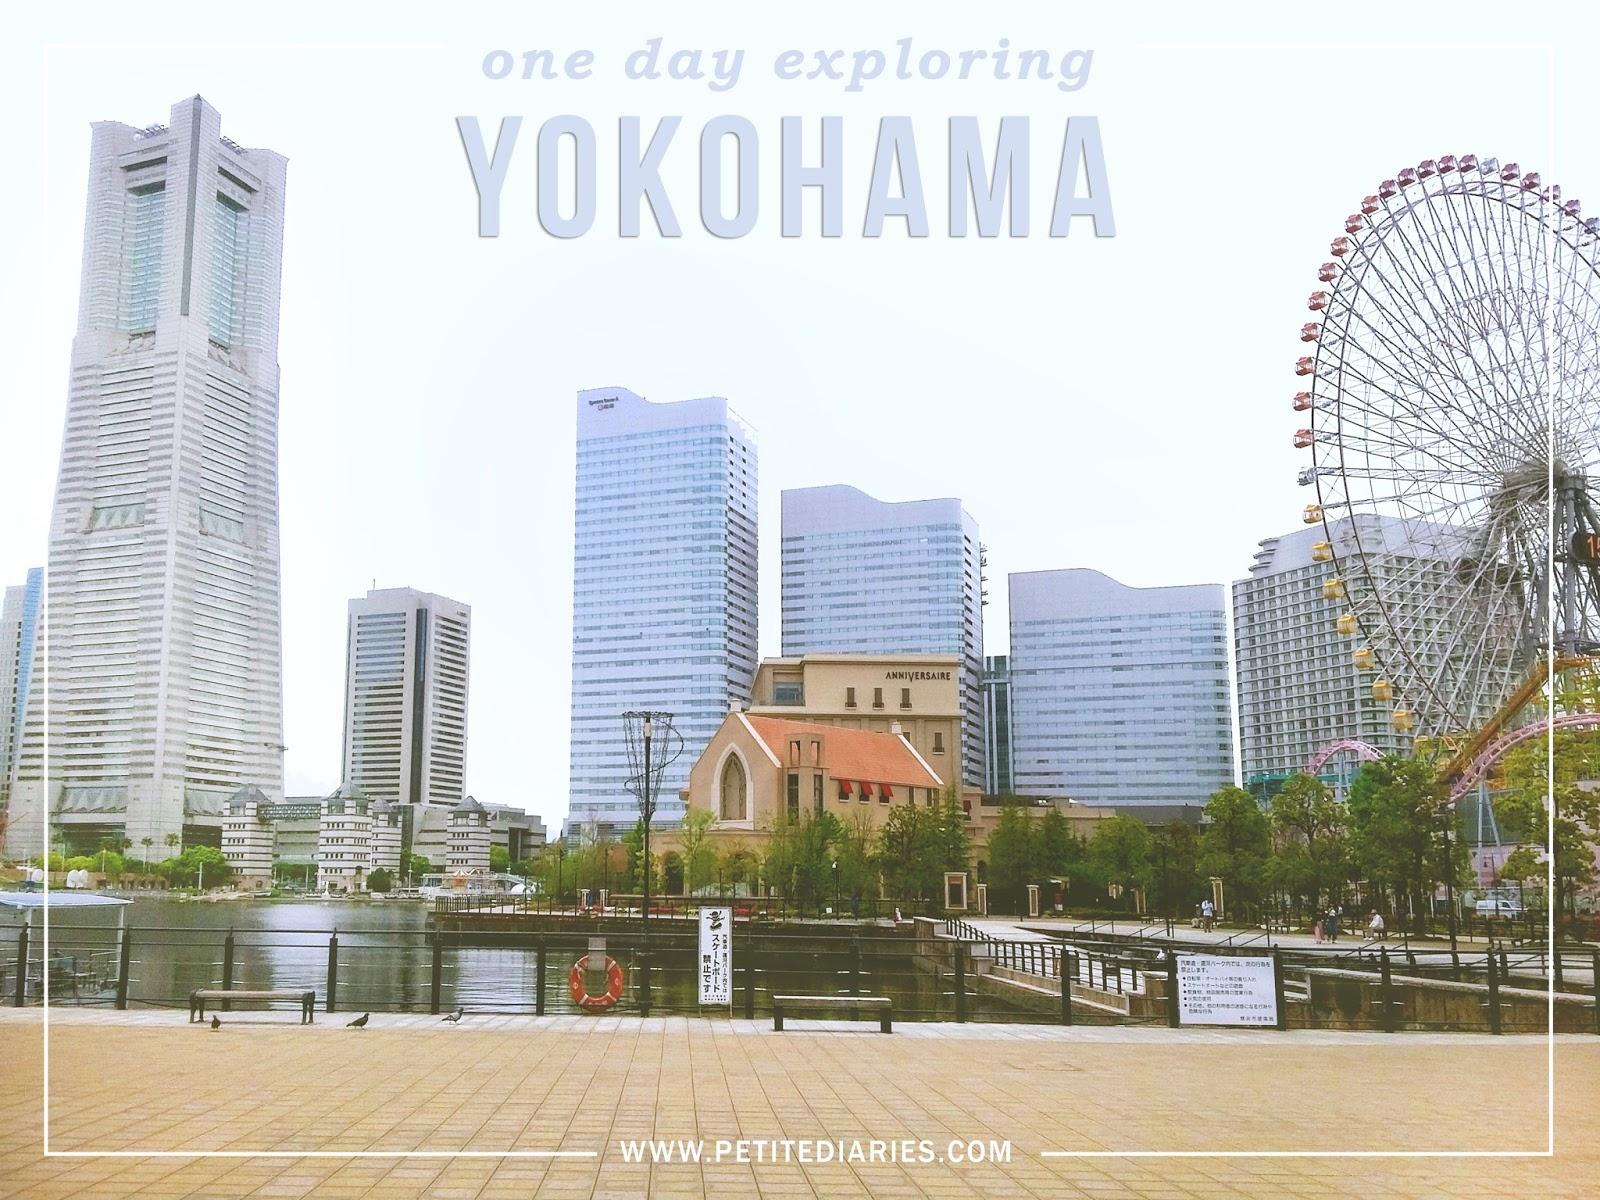 travel to YOKOHAMA in a day